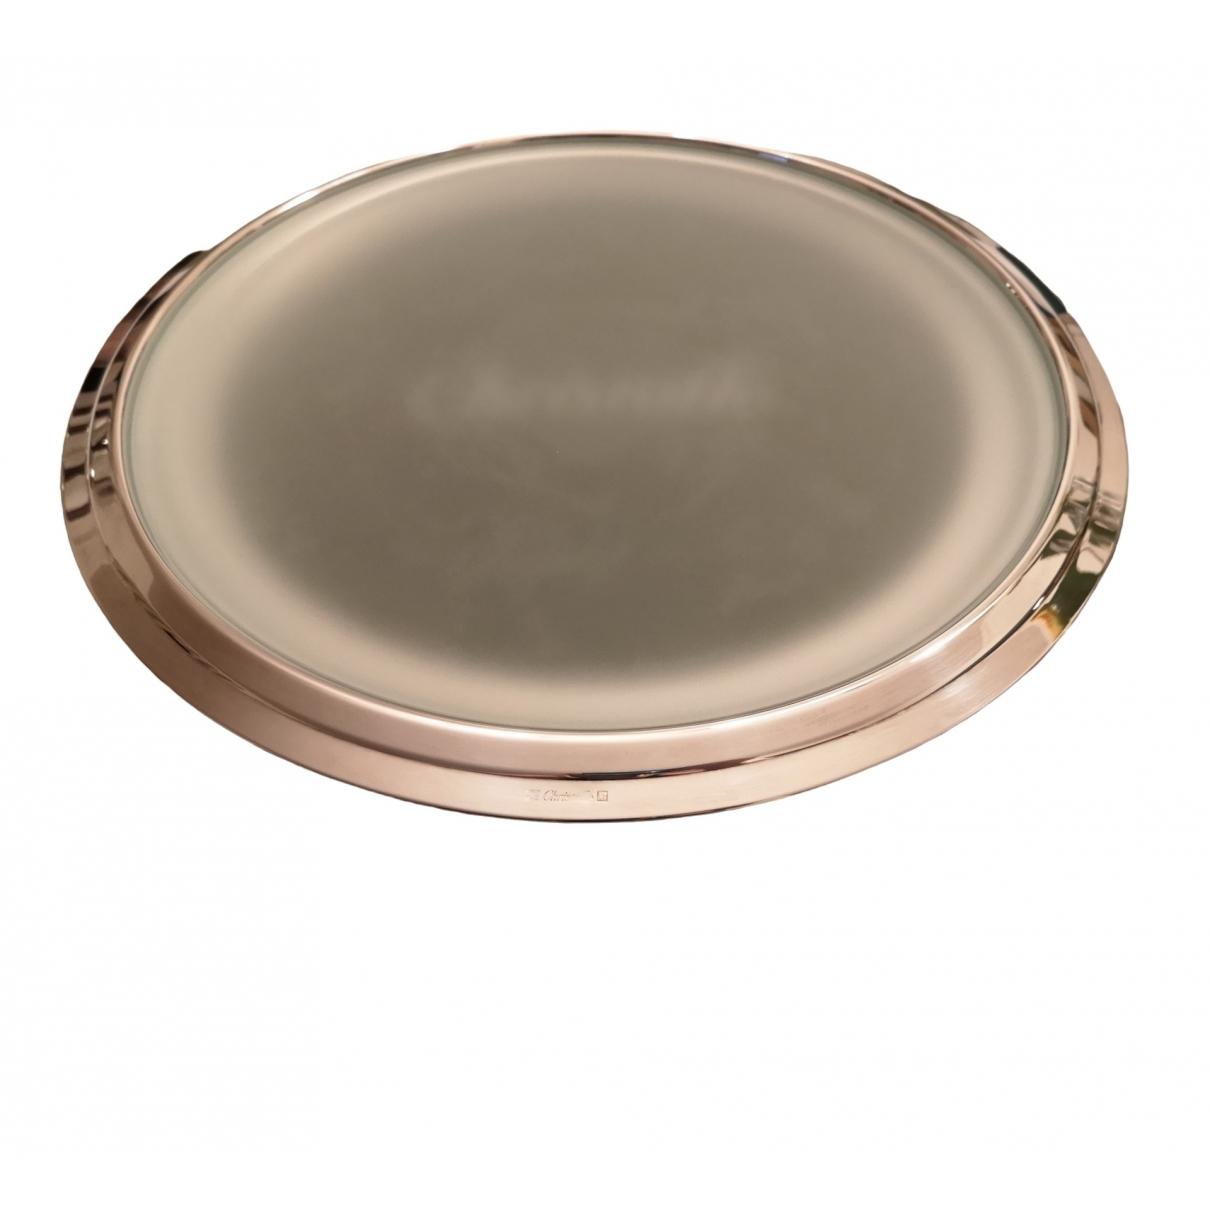 Christofle \N Tischkultur in  Silber Versilbert